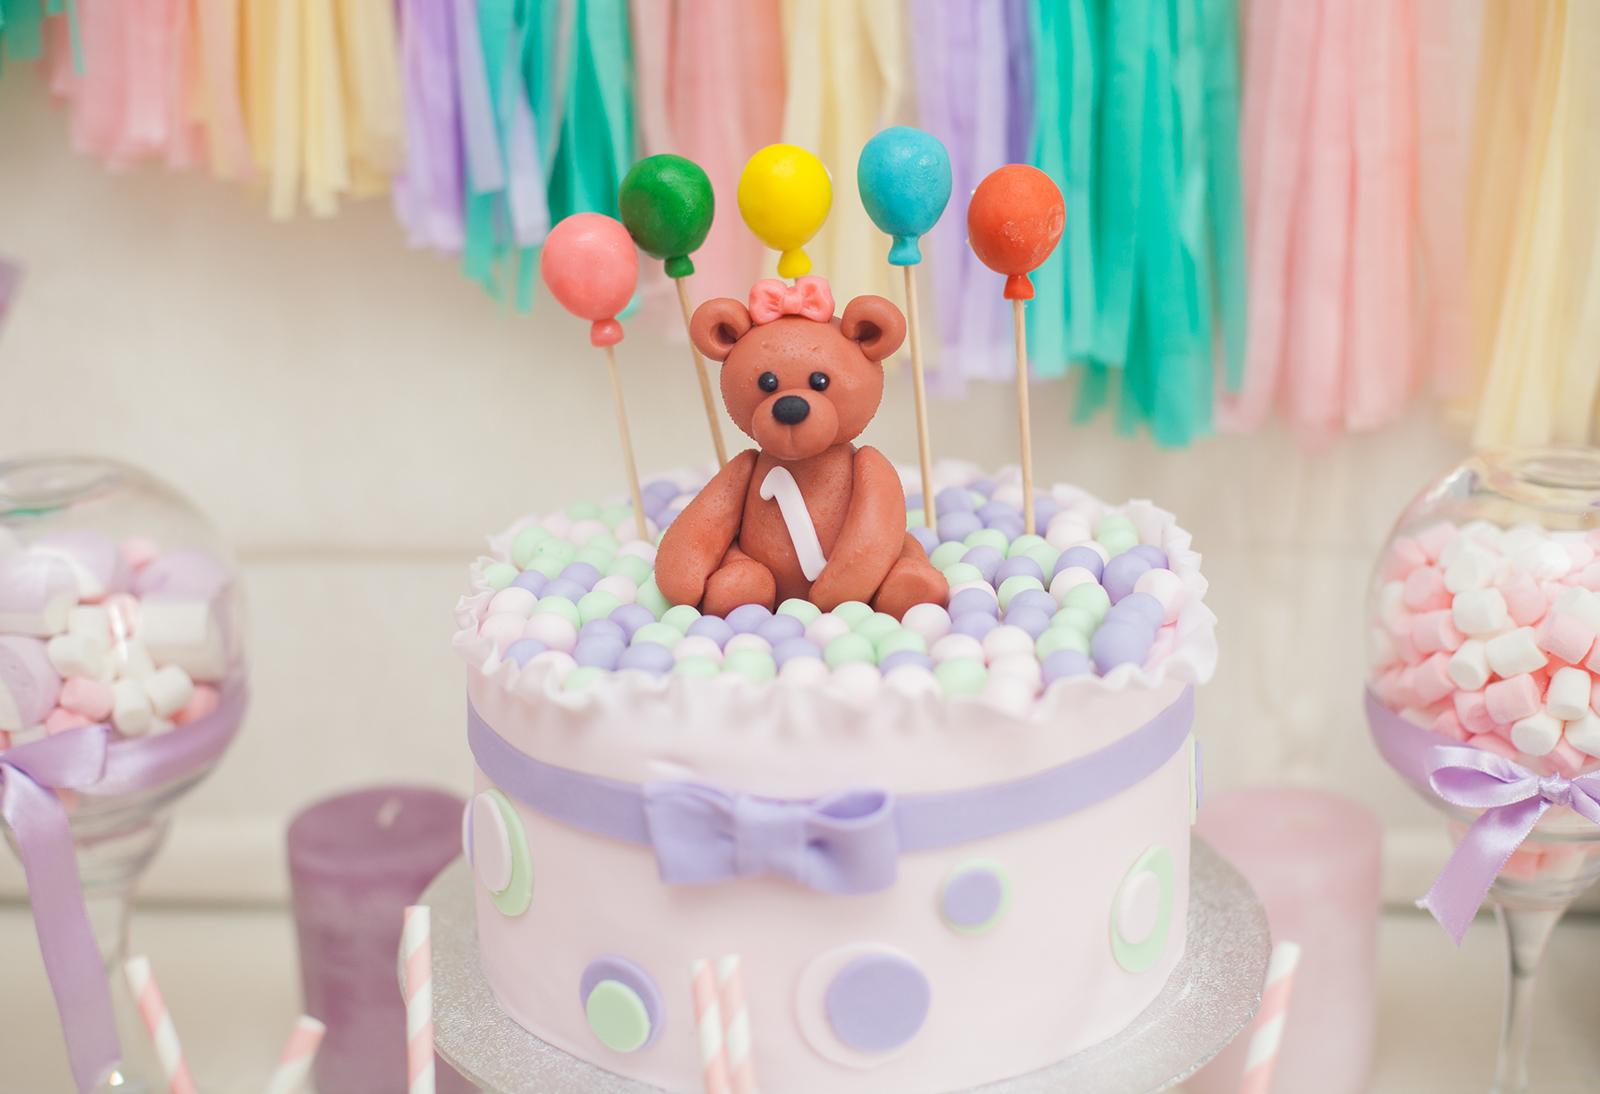 Interesting Baby Shower Games That Make the Celebration Memorable